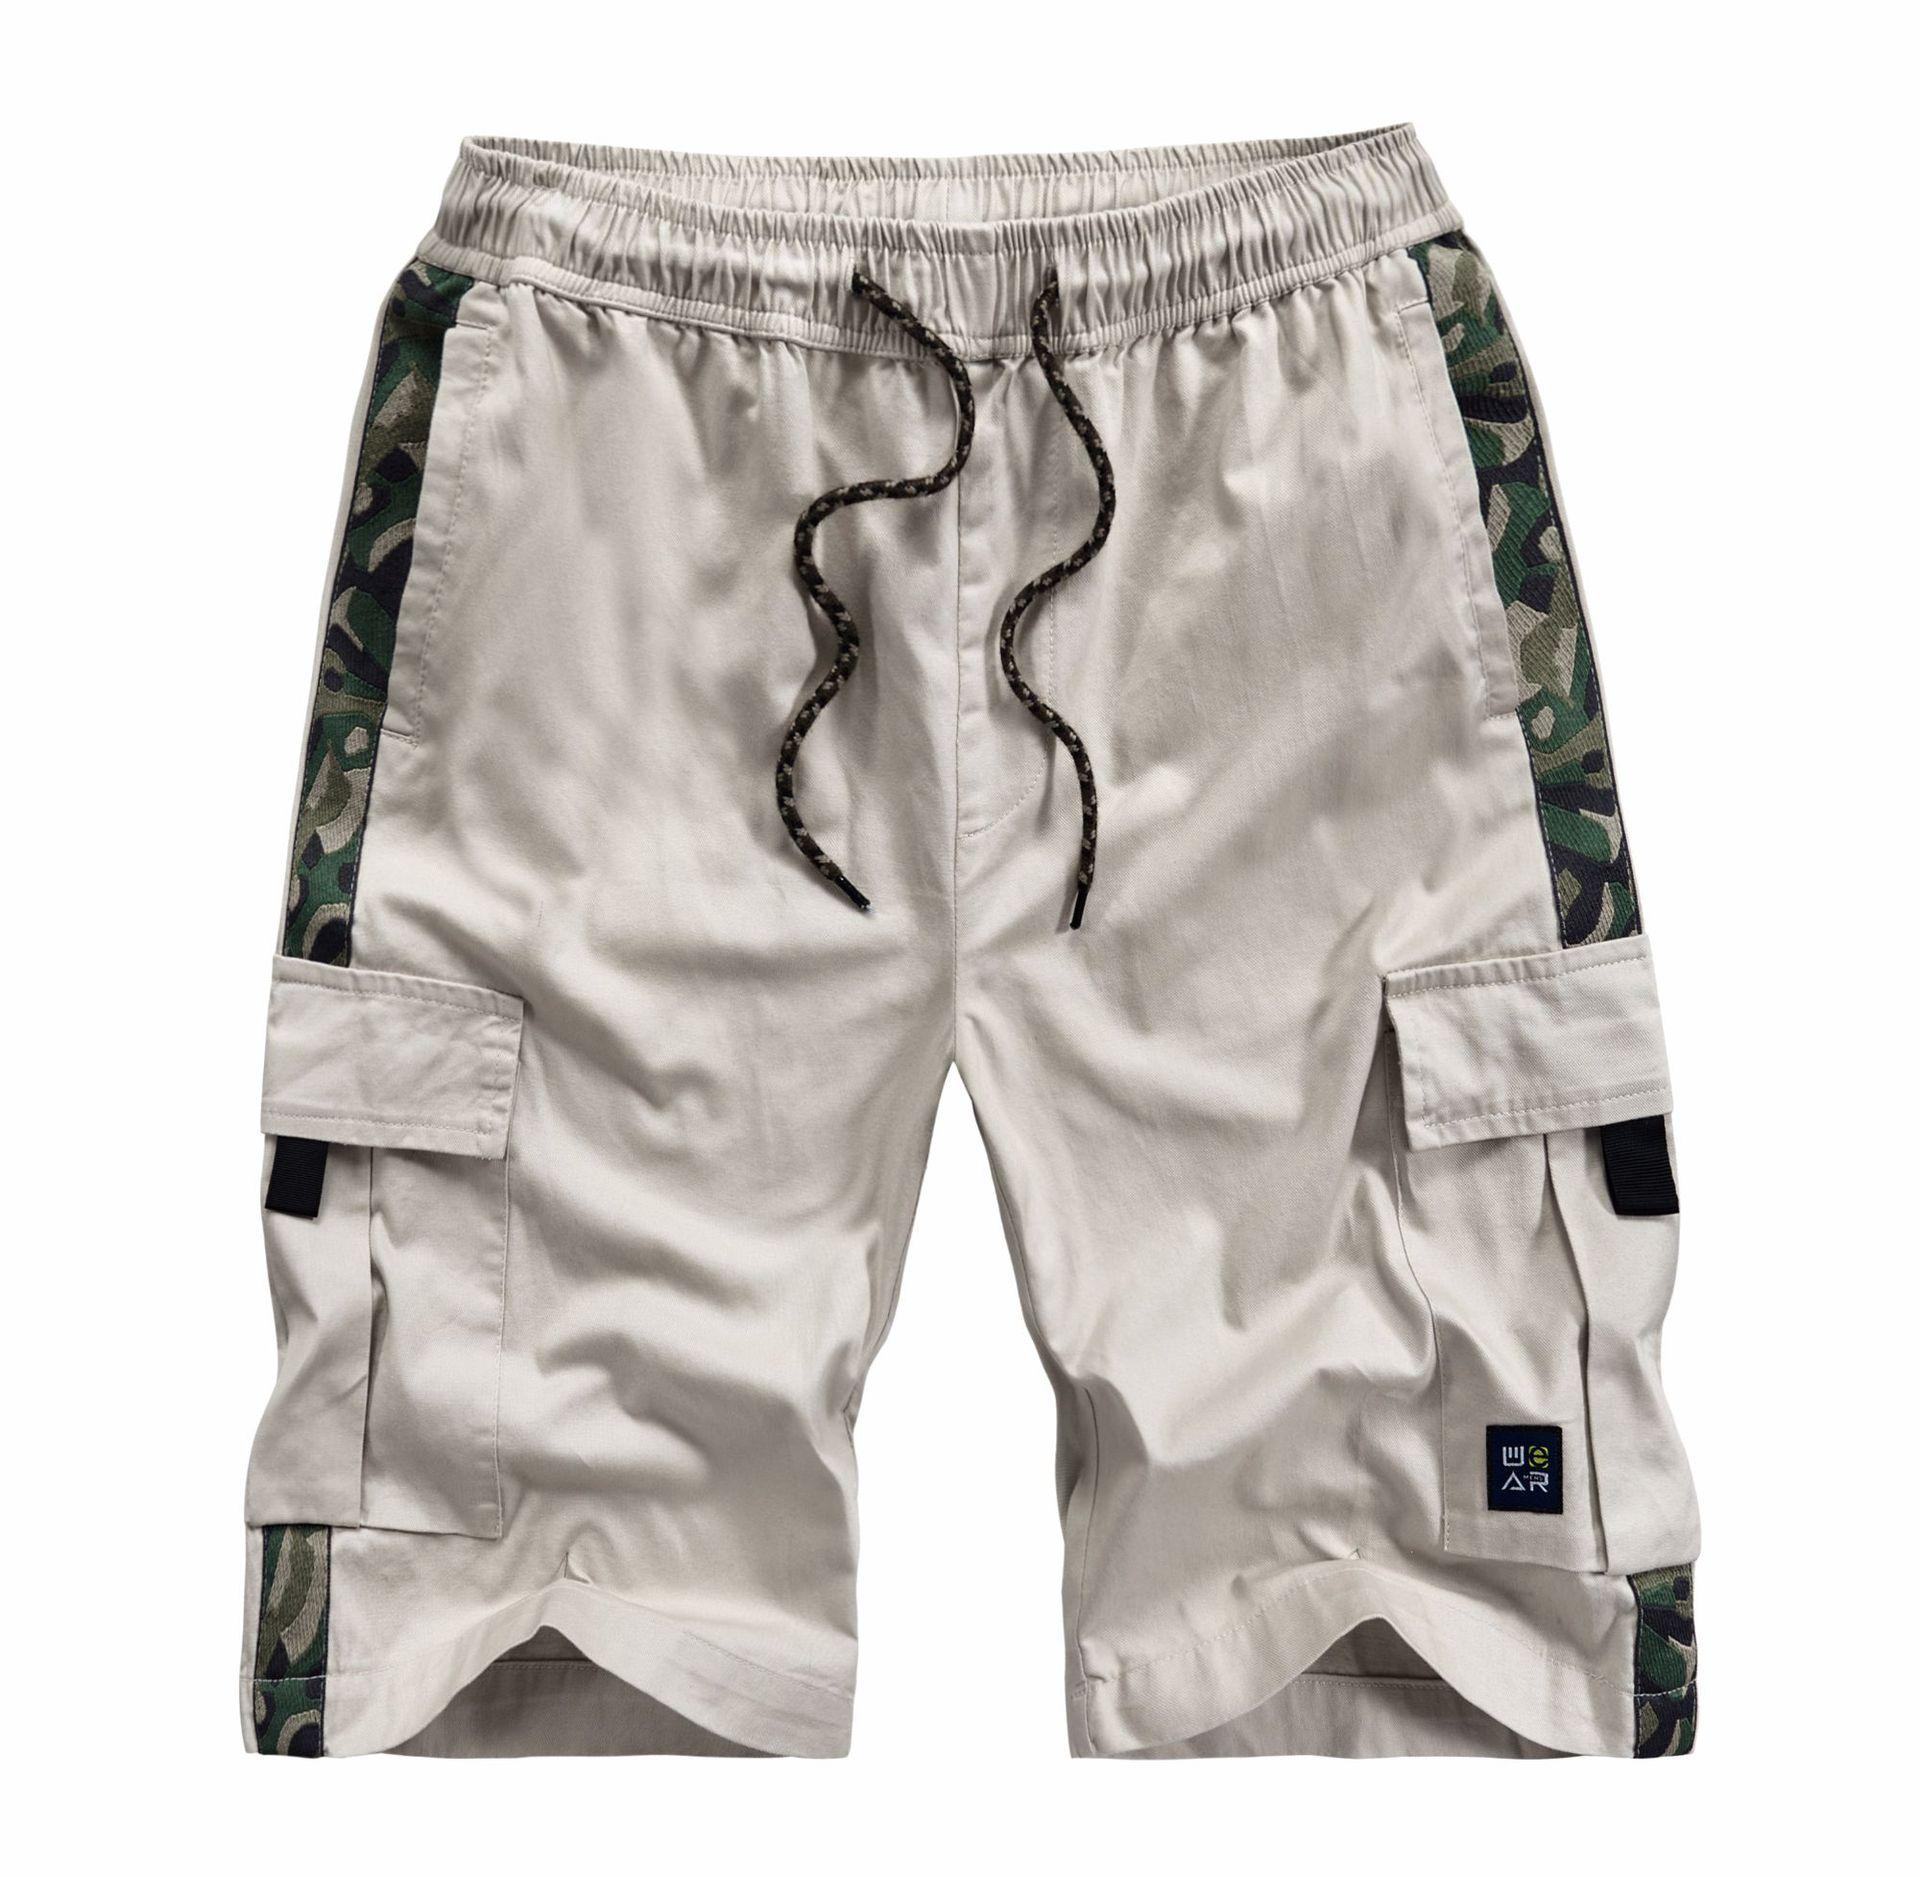 M-8XL Mens Cargo Shorts 2020 Summer Camo Short Cotton Sweatpants Men Camouflage Military Pantalon Corto Hombre